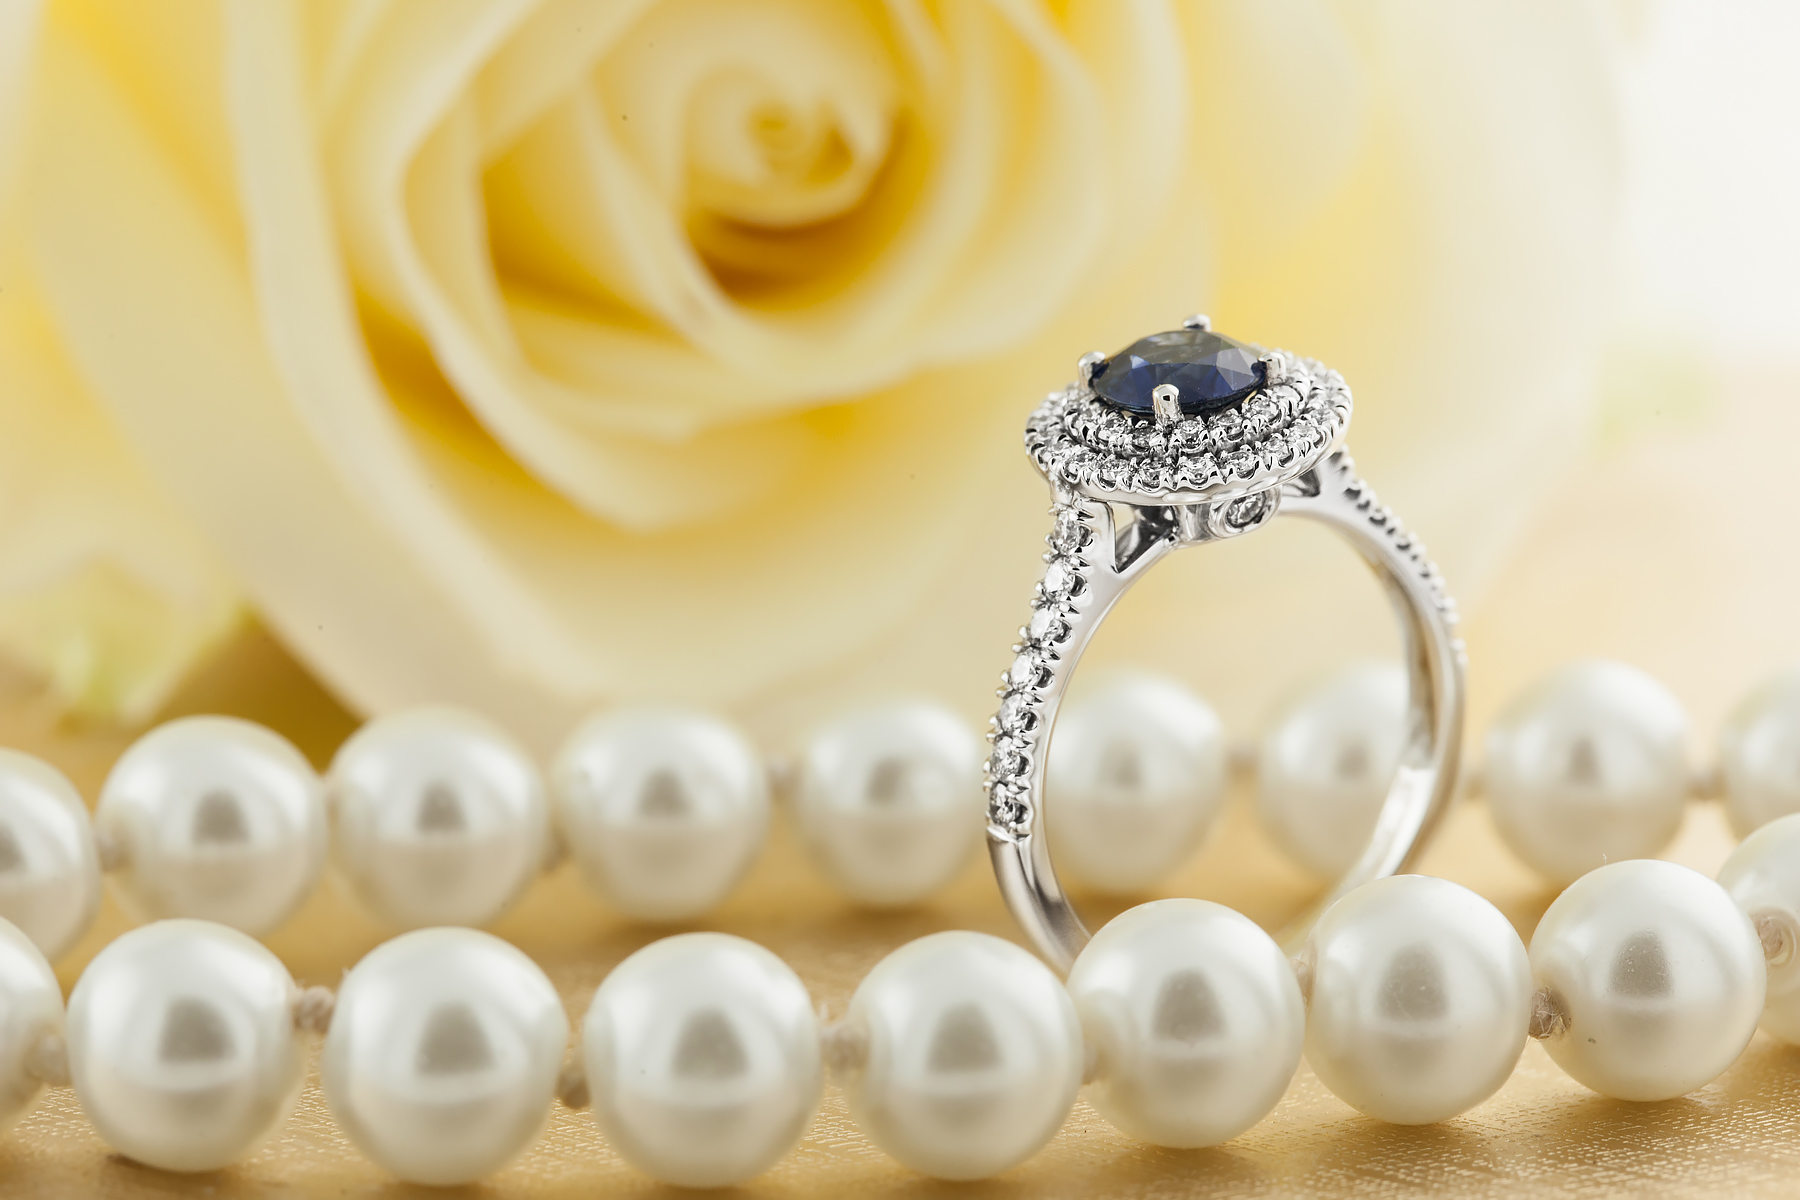 RDS761W-Inel Dama Aur Alb 18kt cu Safir si Diamante, Stil Halo,Design Clasic,Eleganta Moderna-img1